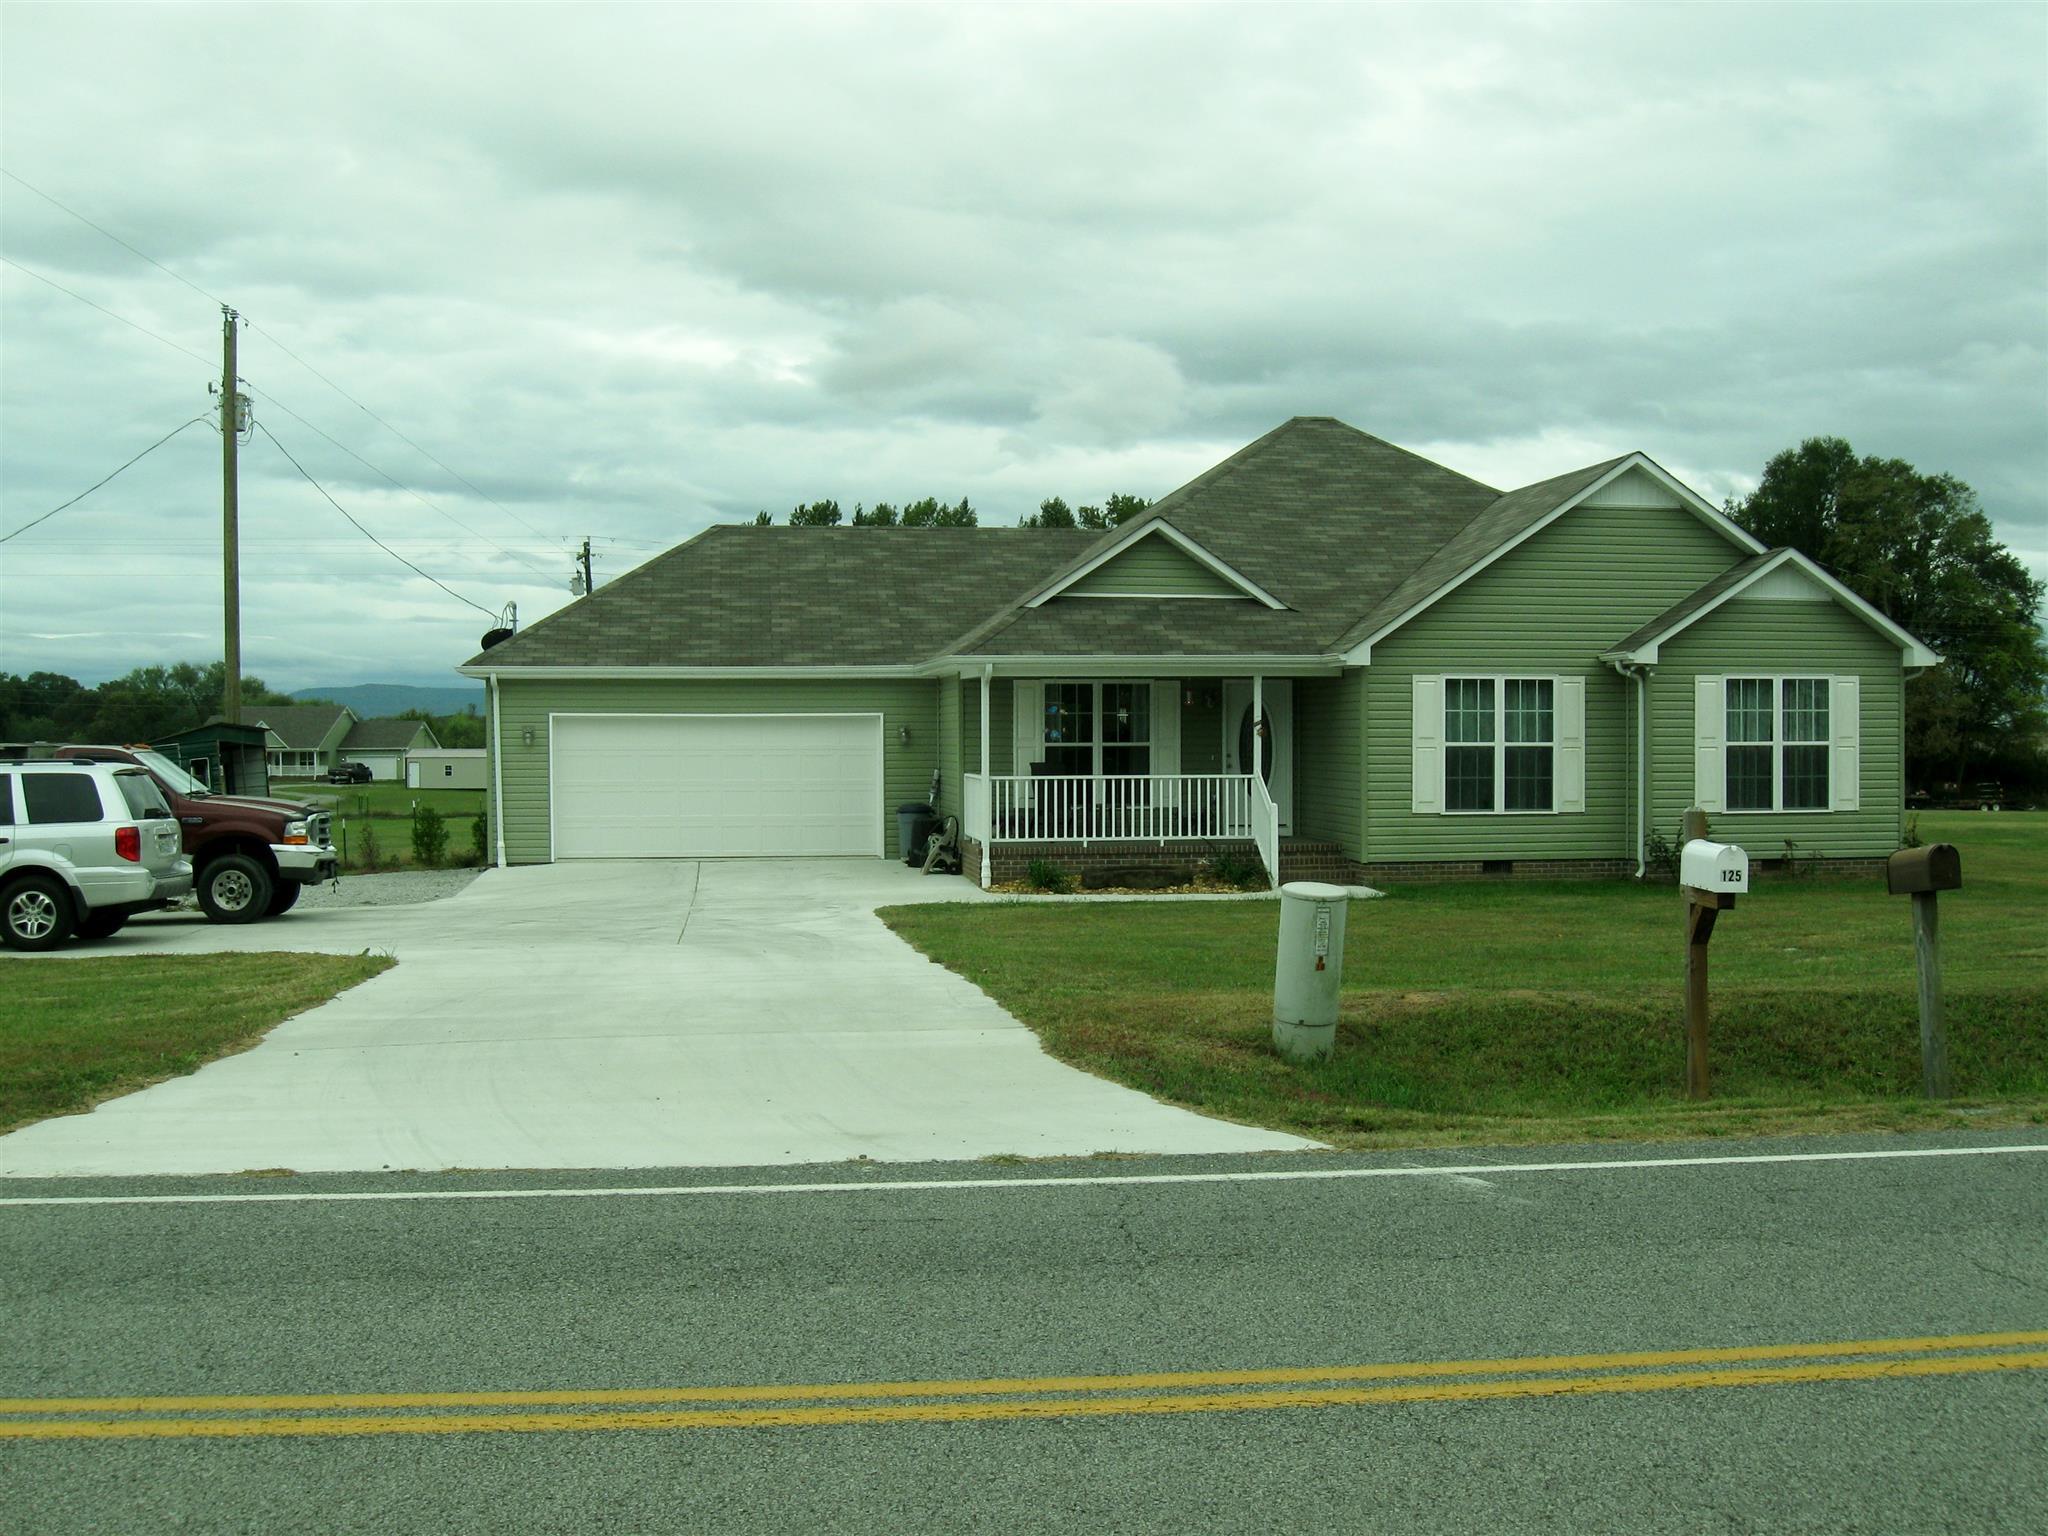 125 Shady Grove Rd, Flintville, TN 37335 - Flintville, TN real estate listing